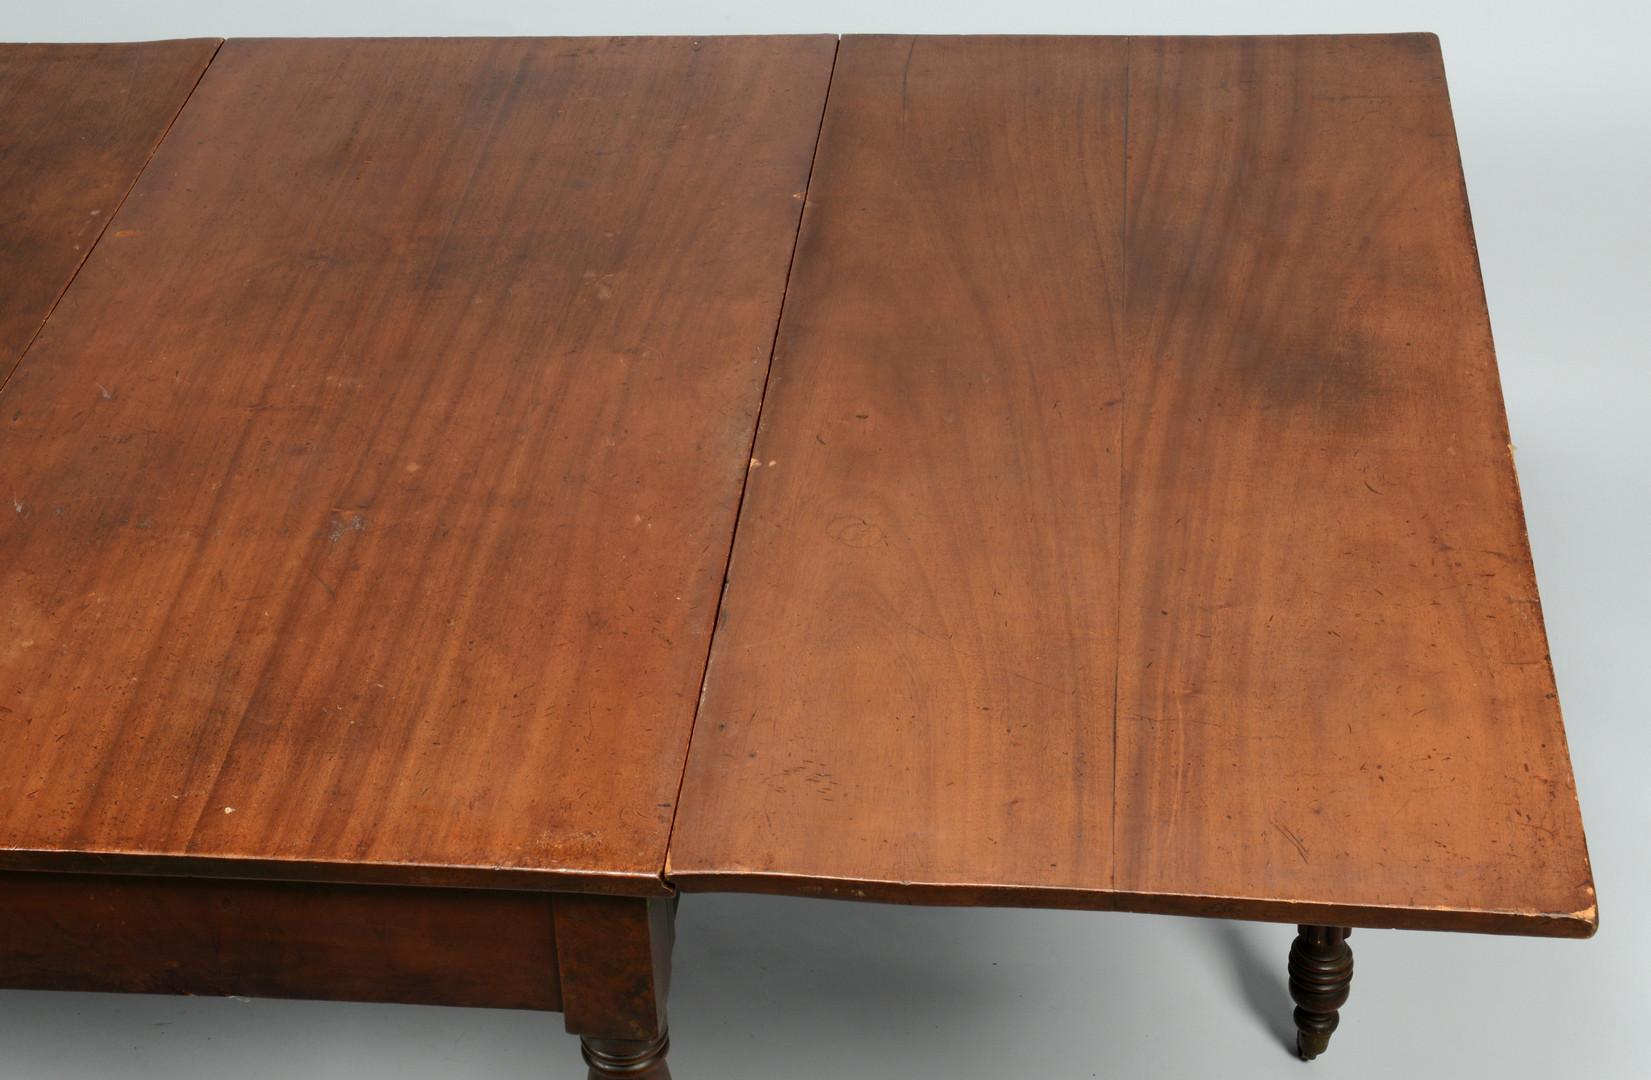 Lot 716: Sheraton Drop Leaf Table